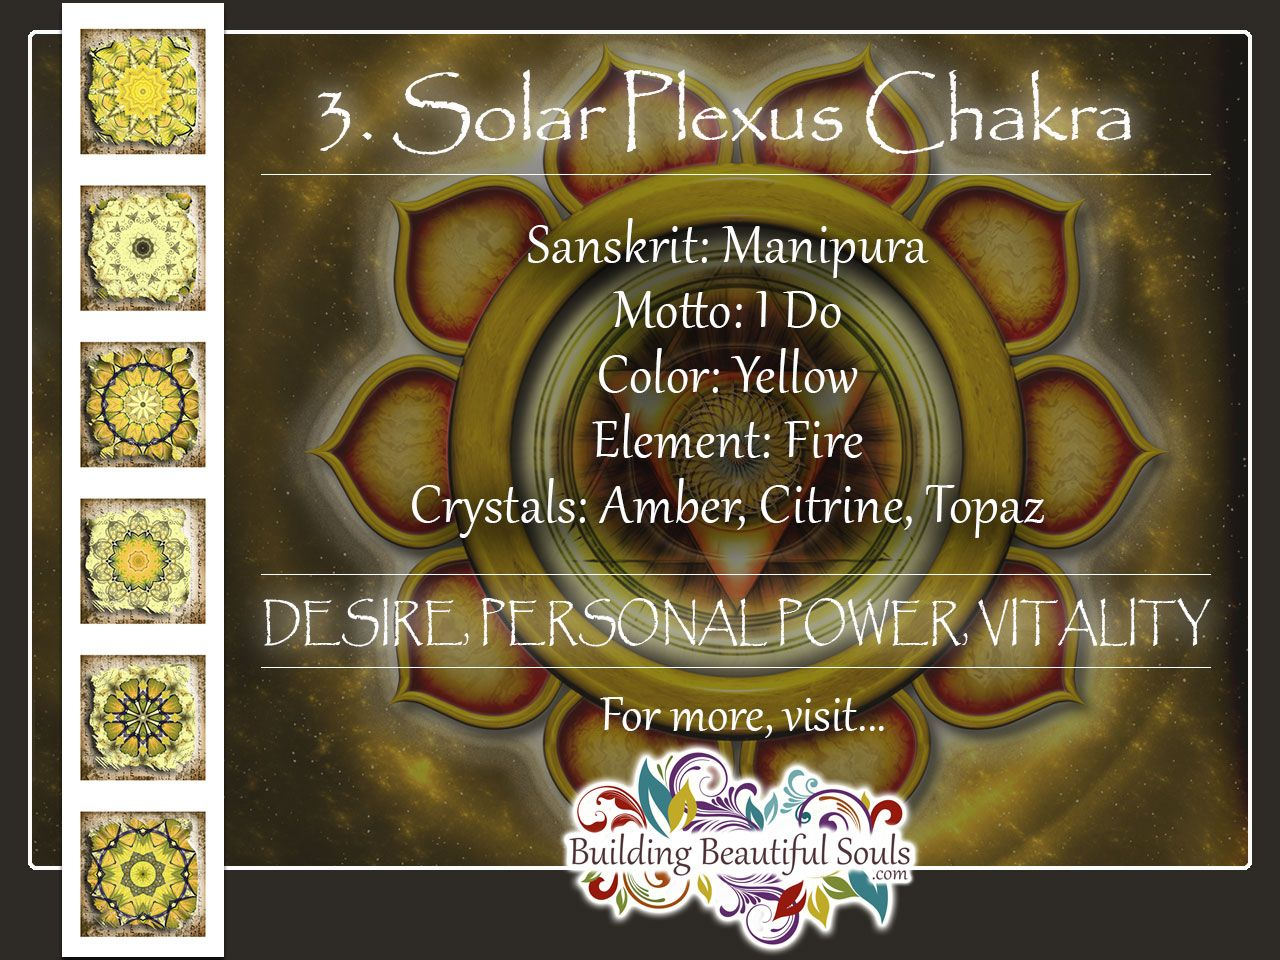 Solar Plexus Chakra, Manipura, 3rd Yellow Chakra Meaning 1280x960